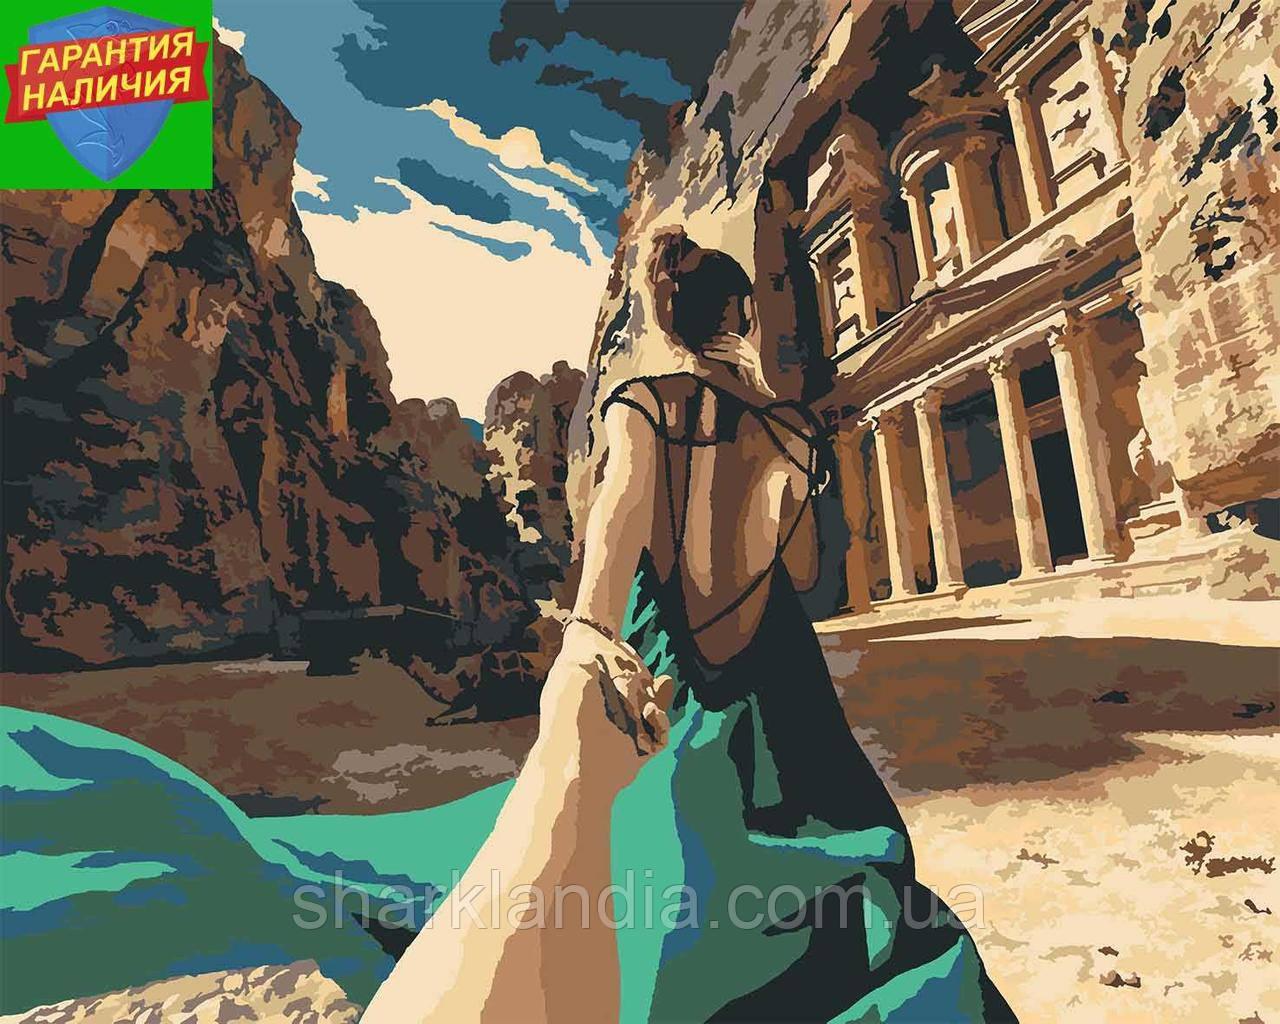 Картина по номерам Следуй за мной Иордания Мурад Осман (цветной холст) 40*50см Барви Розпис по номерах